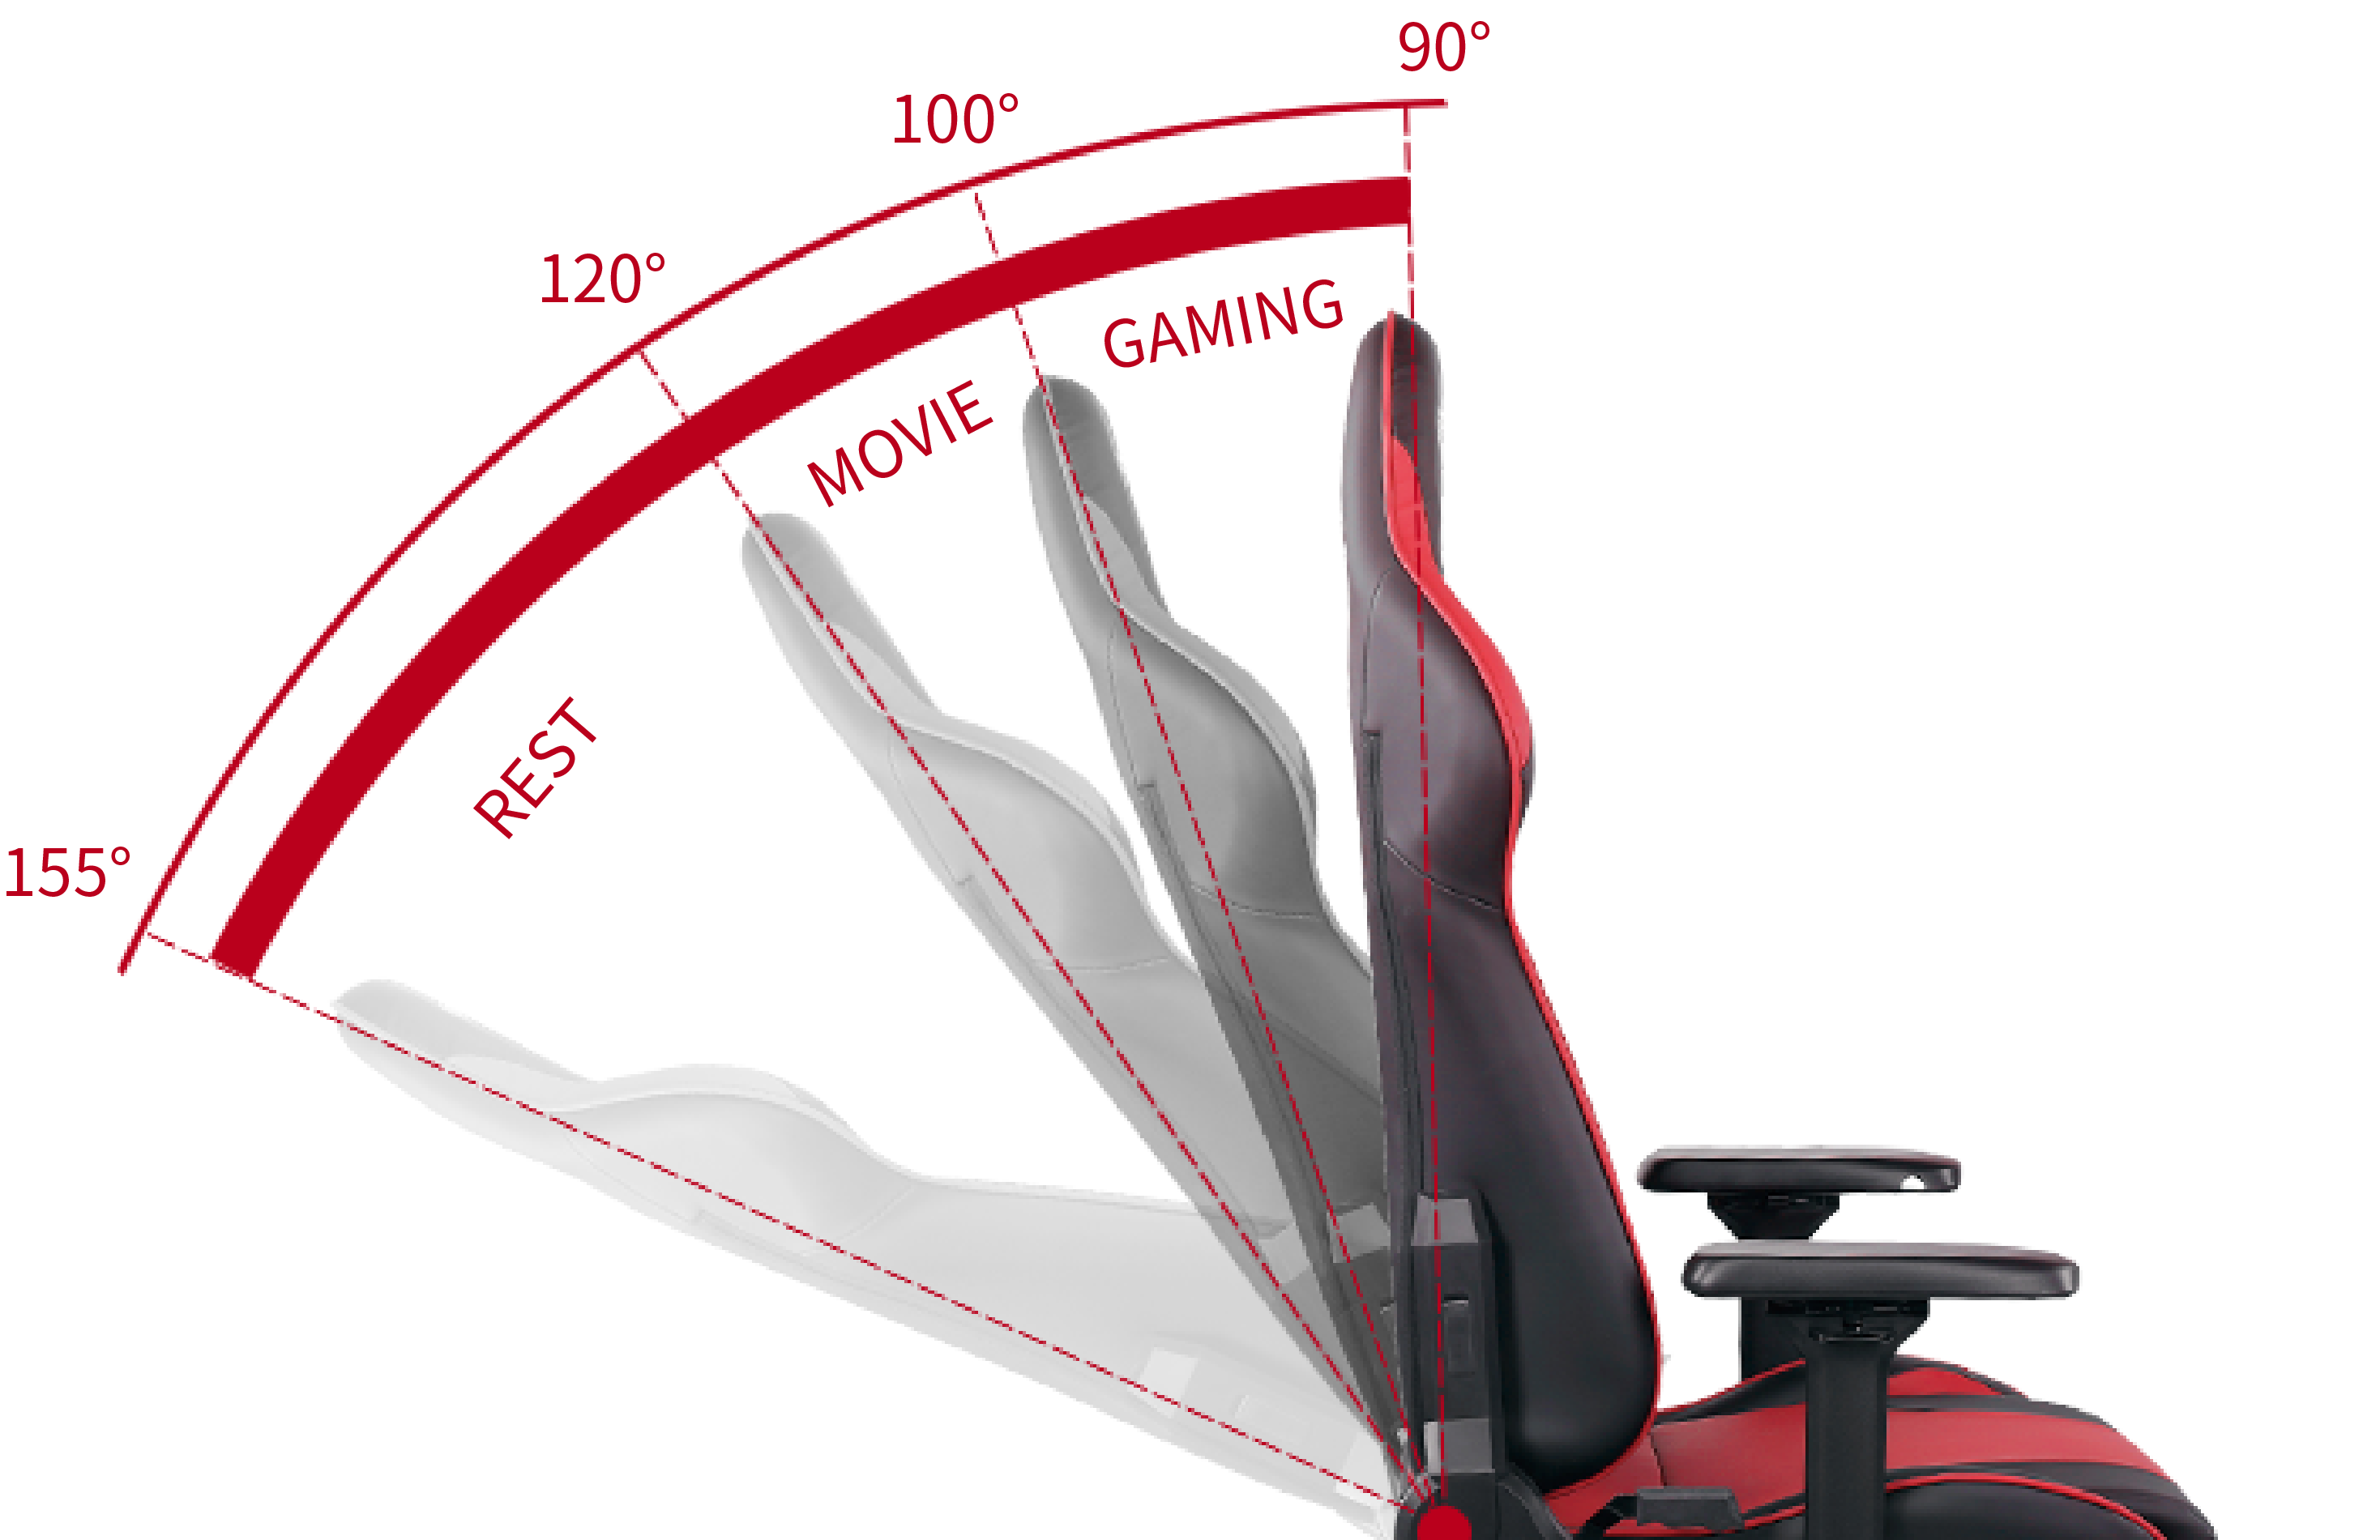 DXRacer-Model K-155 Angle Backrest-infographic